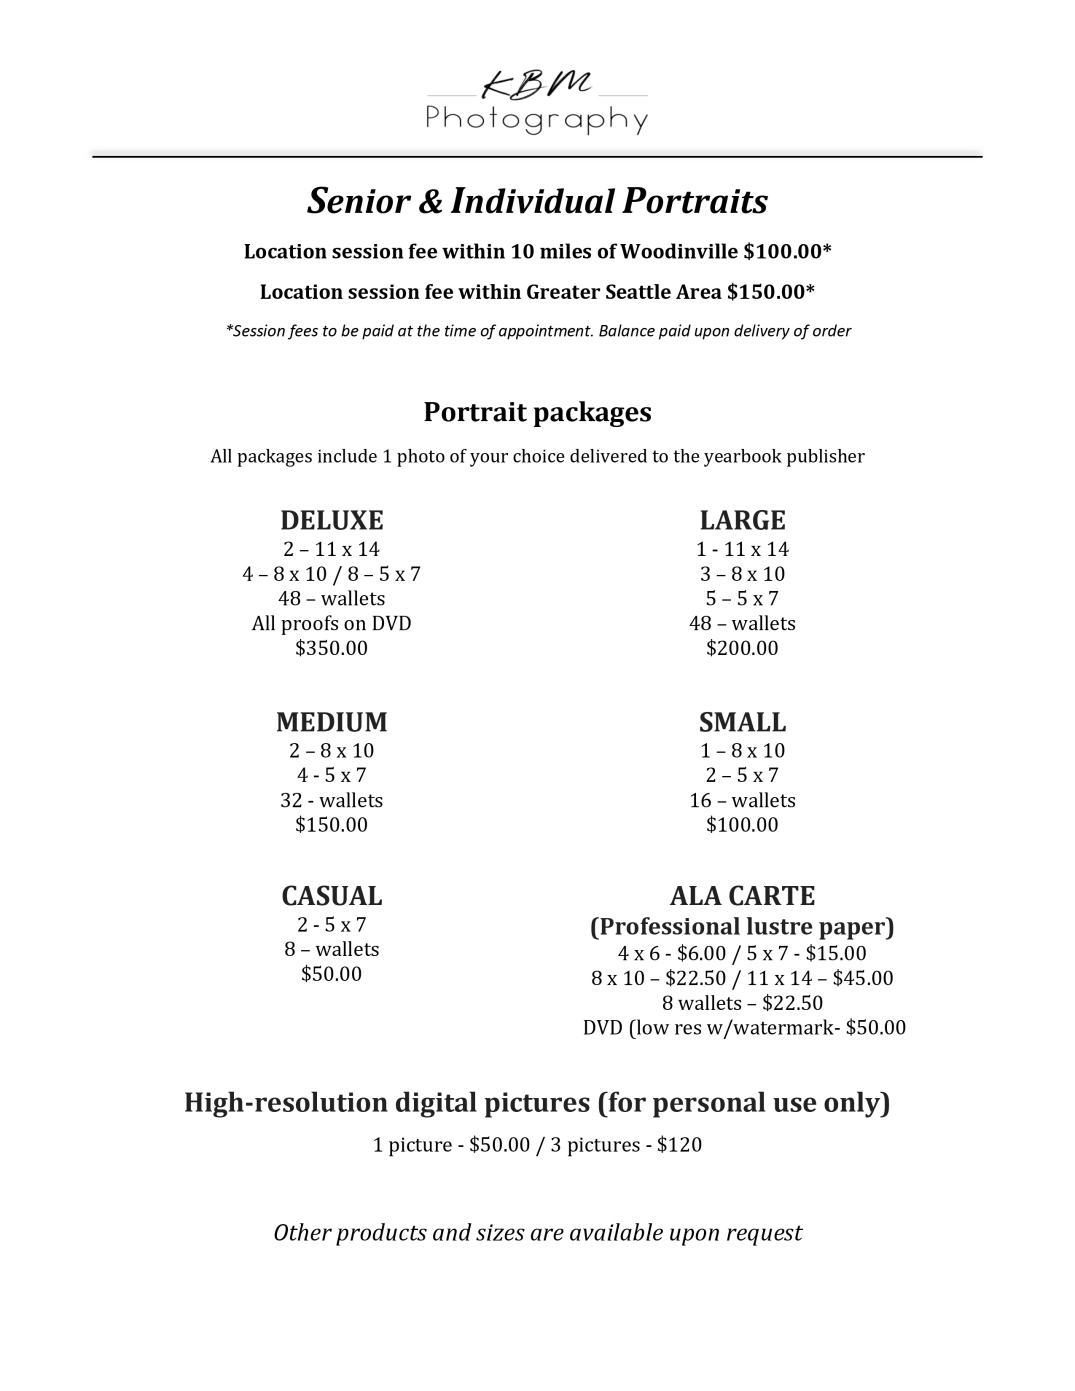 KBM Photography 2020 price sheet